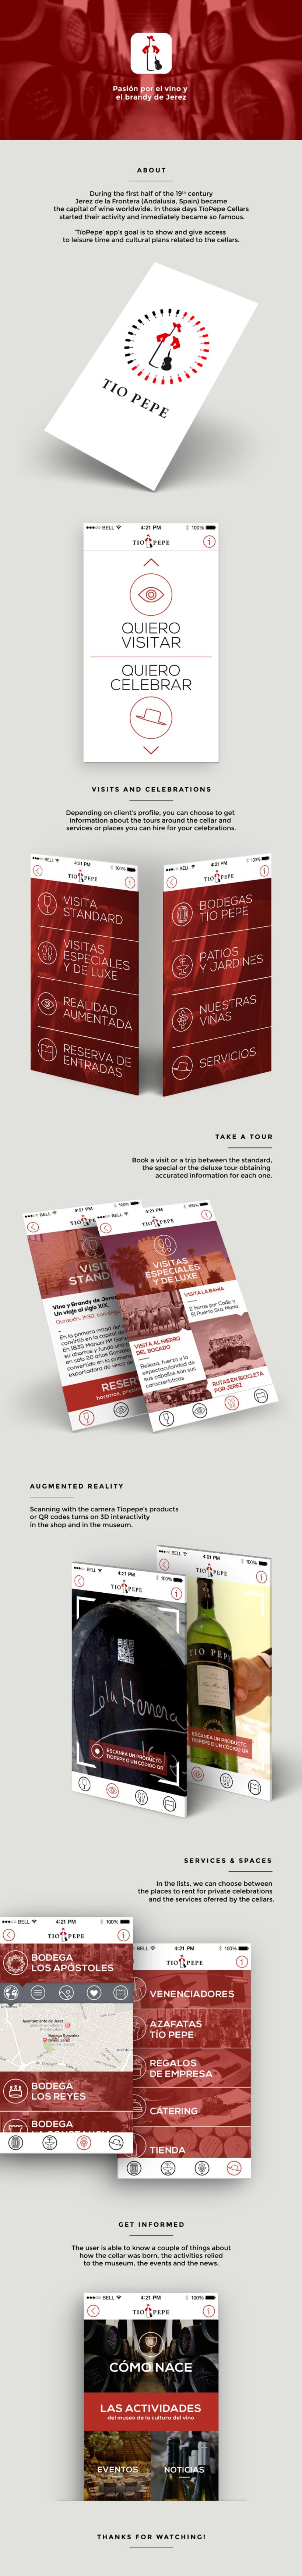 TioPepe app -1